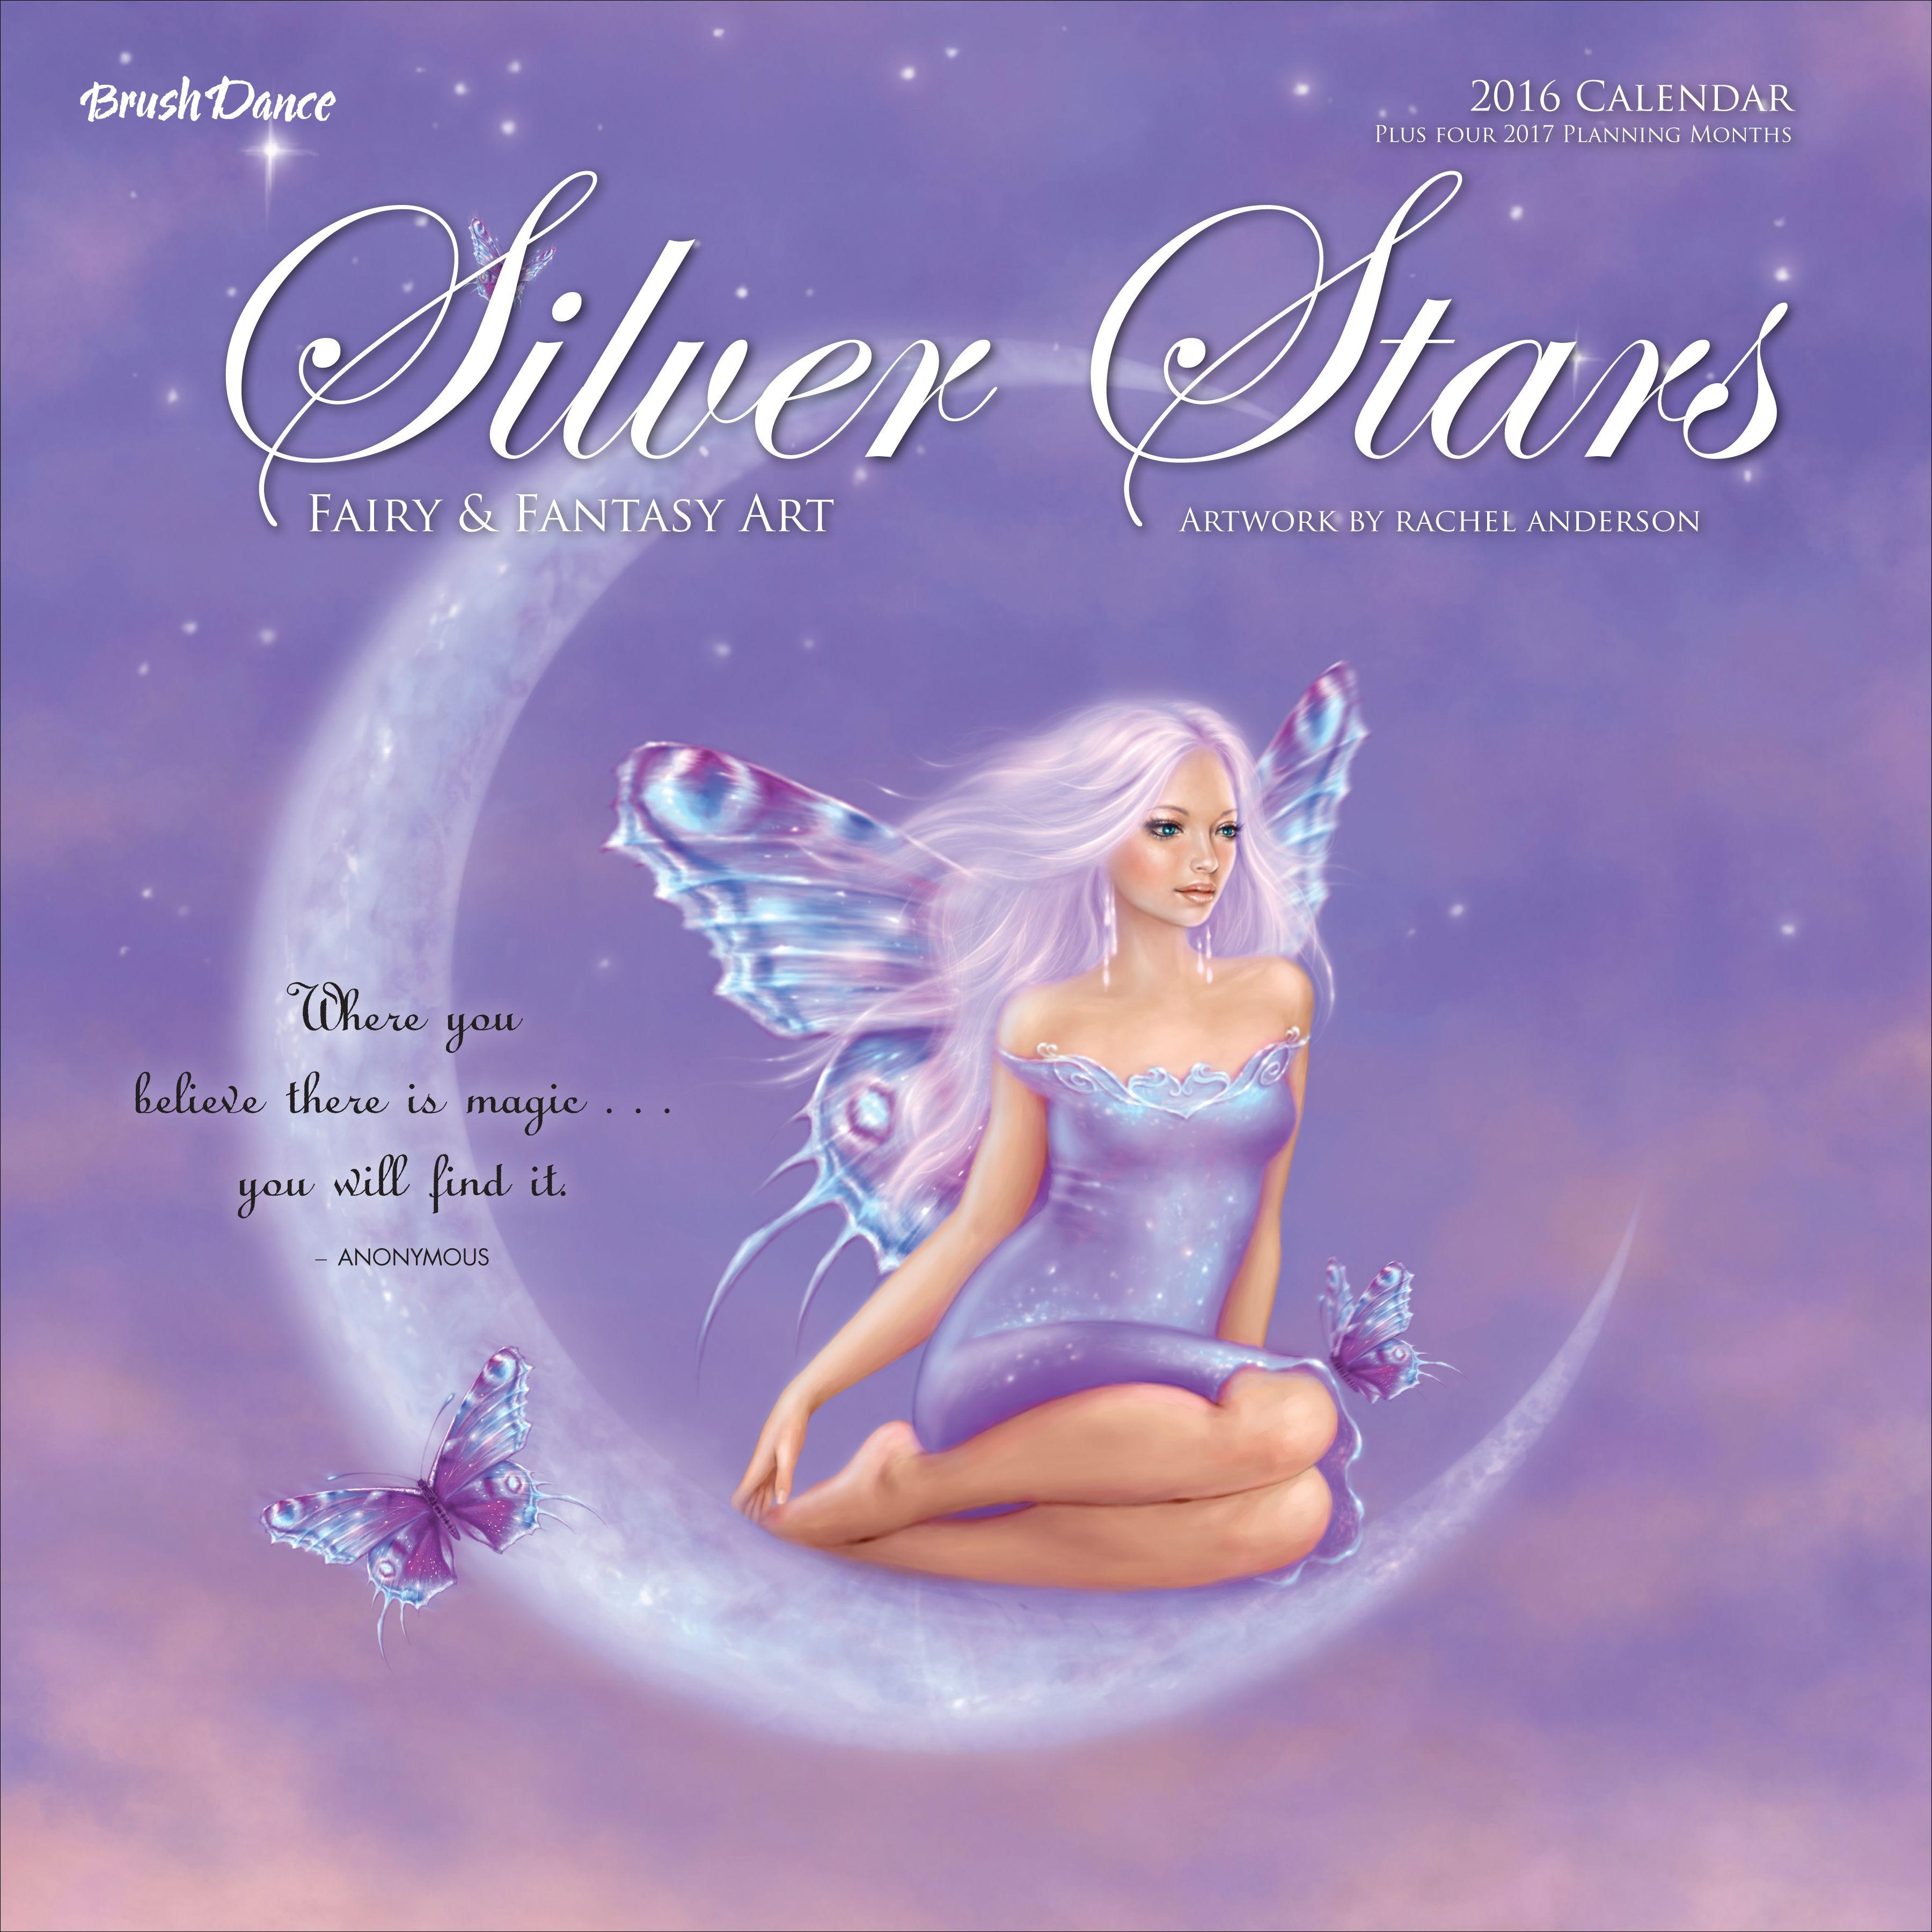 Brush Dance Silver Stars 2016 Wall Calendar Featuring